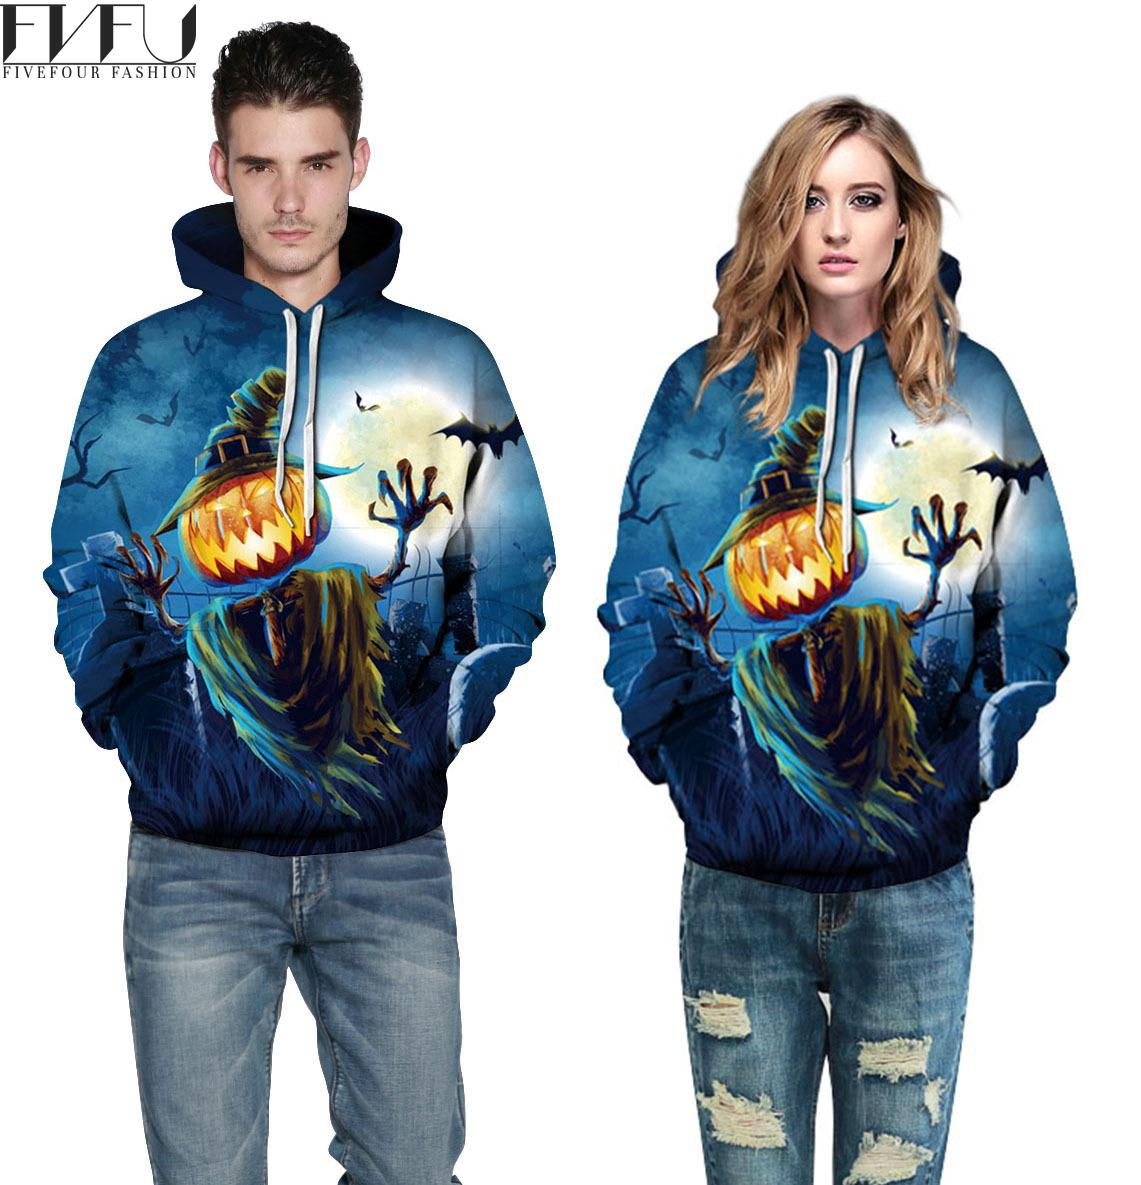 Fashion 2018 Hoodies Sweatshirt Women Men Autumn Winter Pumpkin Halloween Hoodies 3d Print Couples Tops Casual Hoodies Plus Size